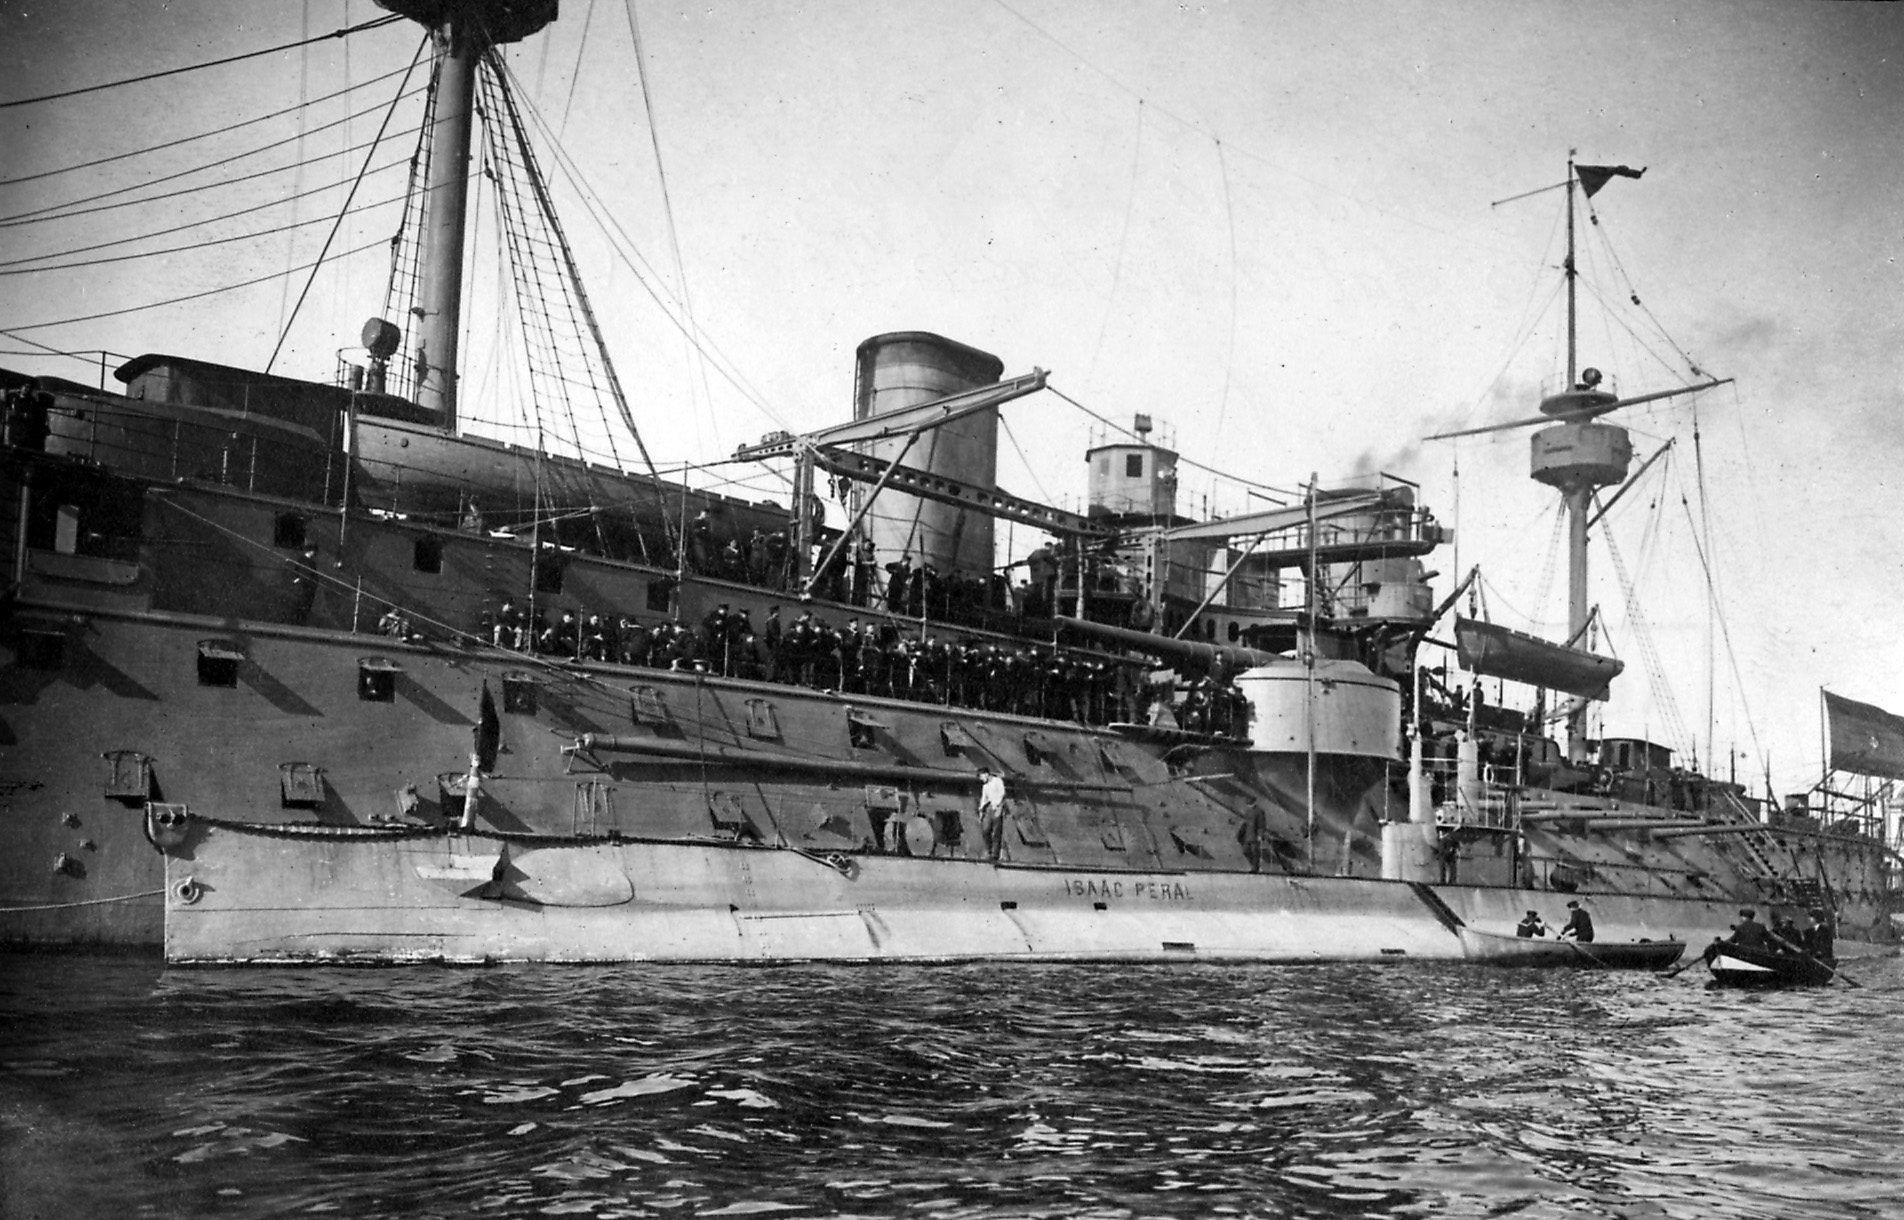 centenario-submarino-armada-4.jpg